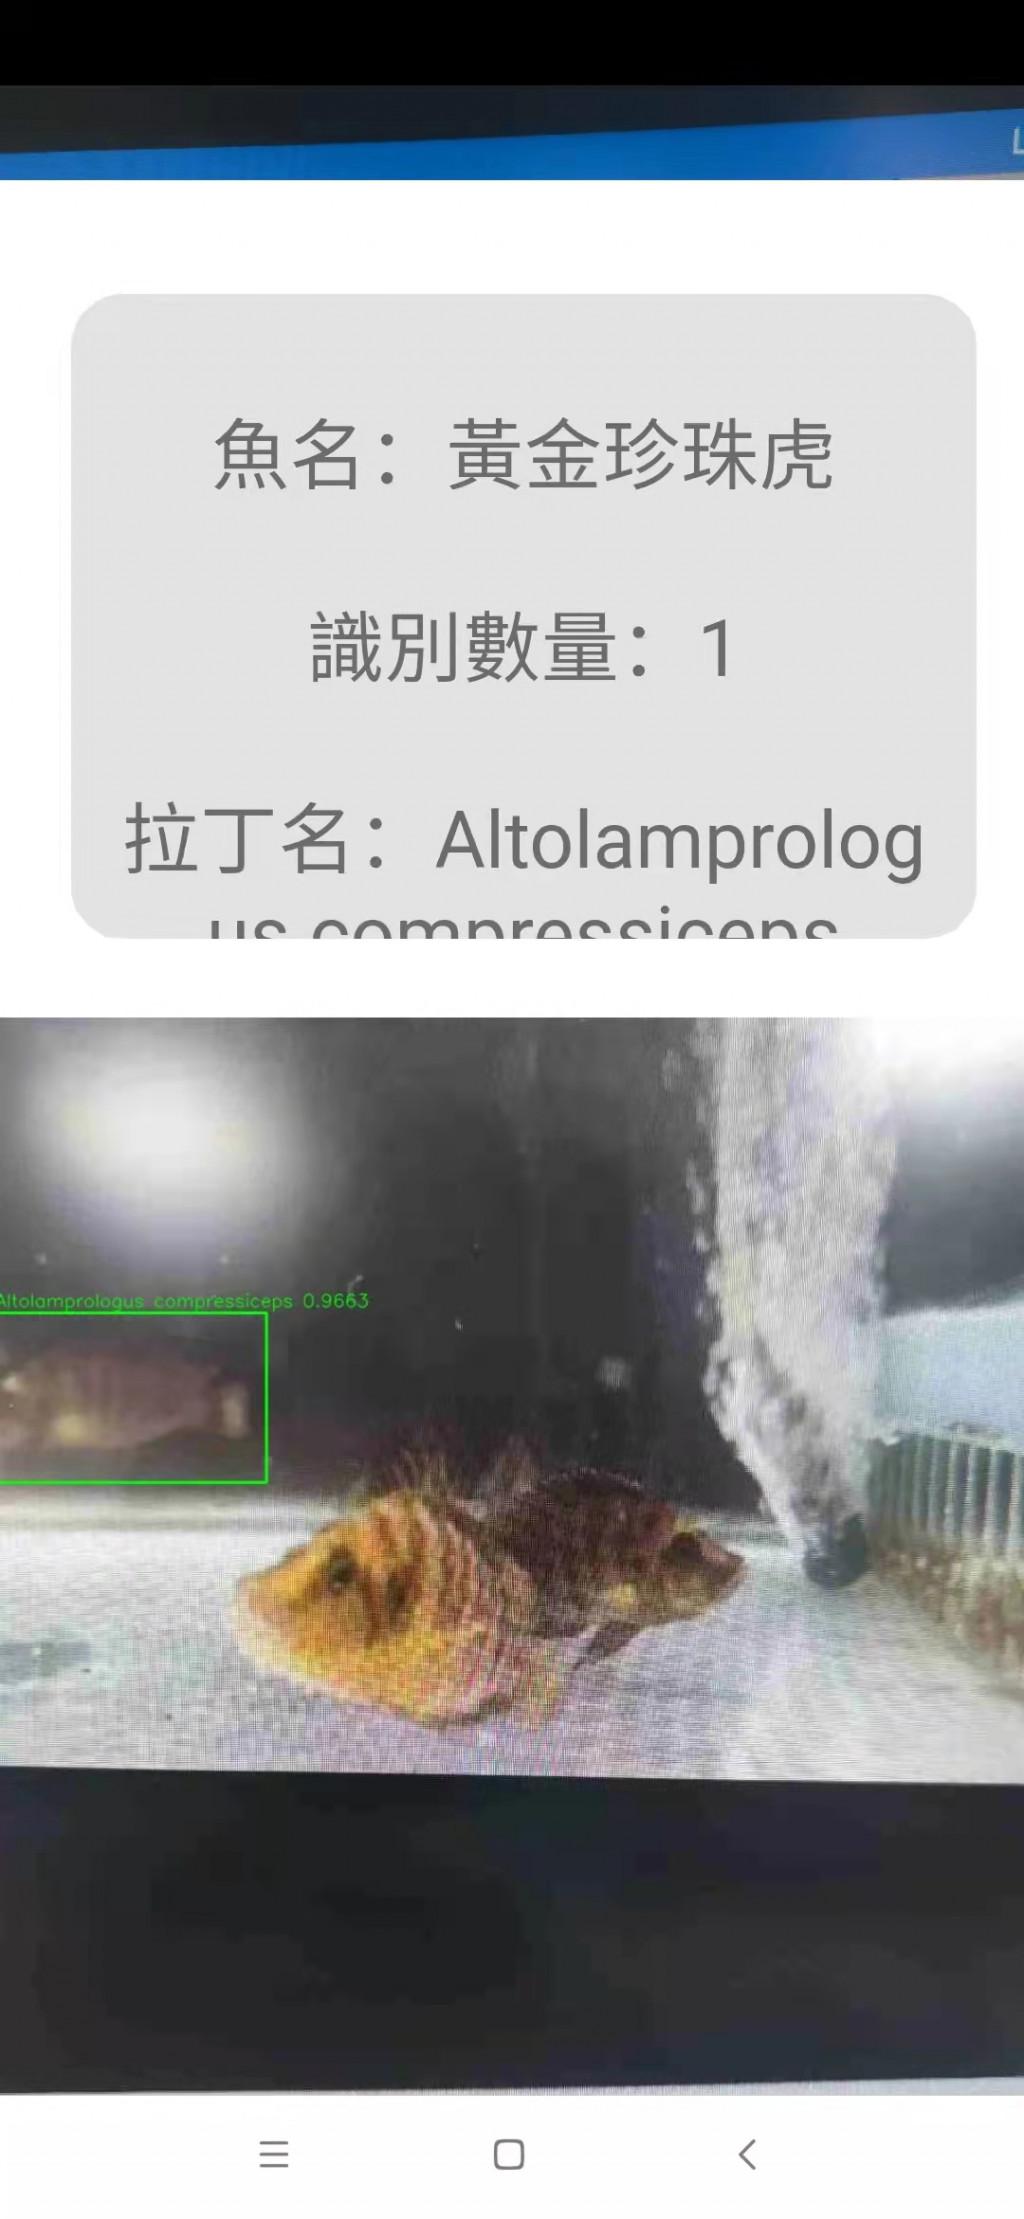 https://ithelp.ithome.com.tw/upload/images/20210926/20129510RTFNczeoyV.jpg